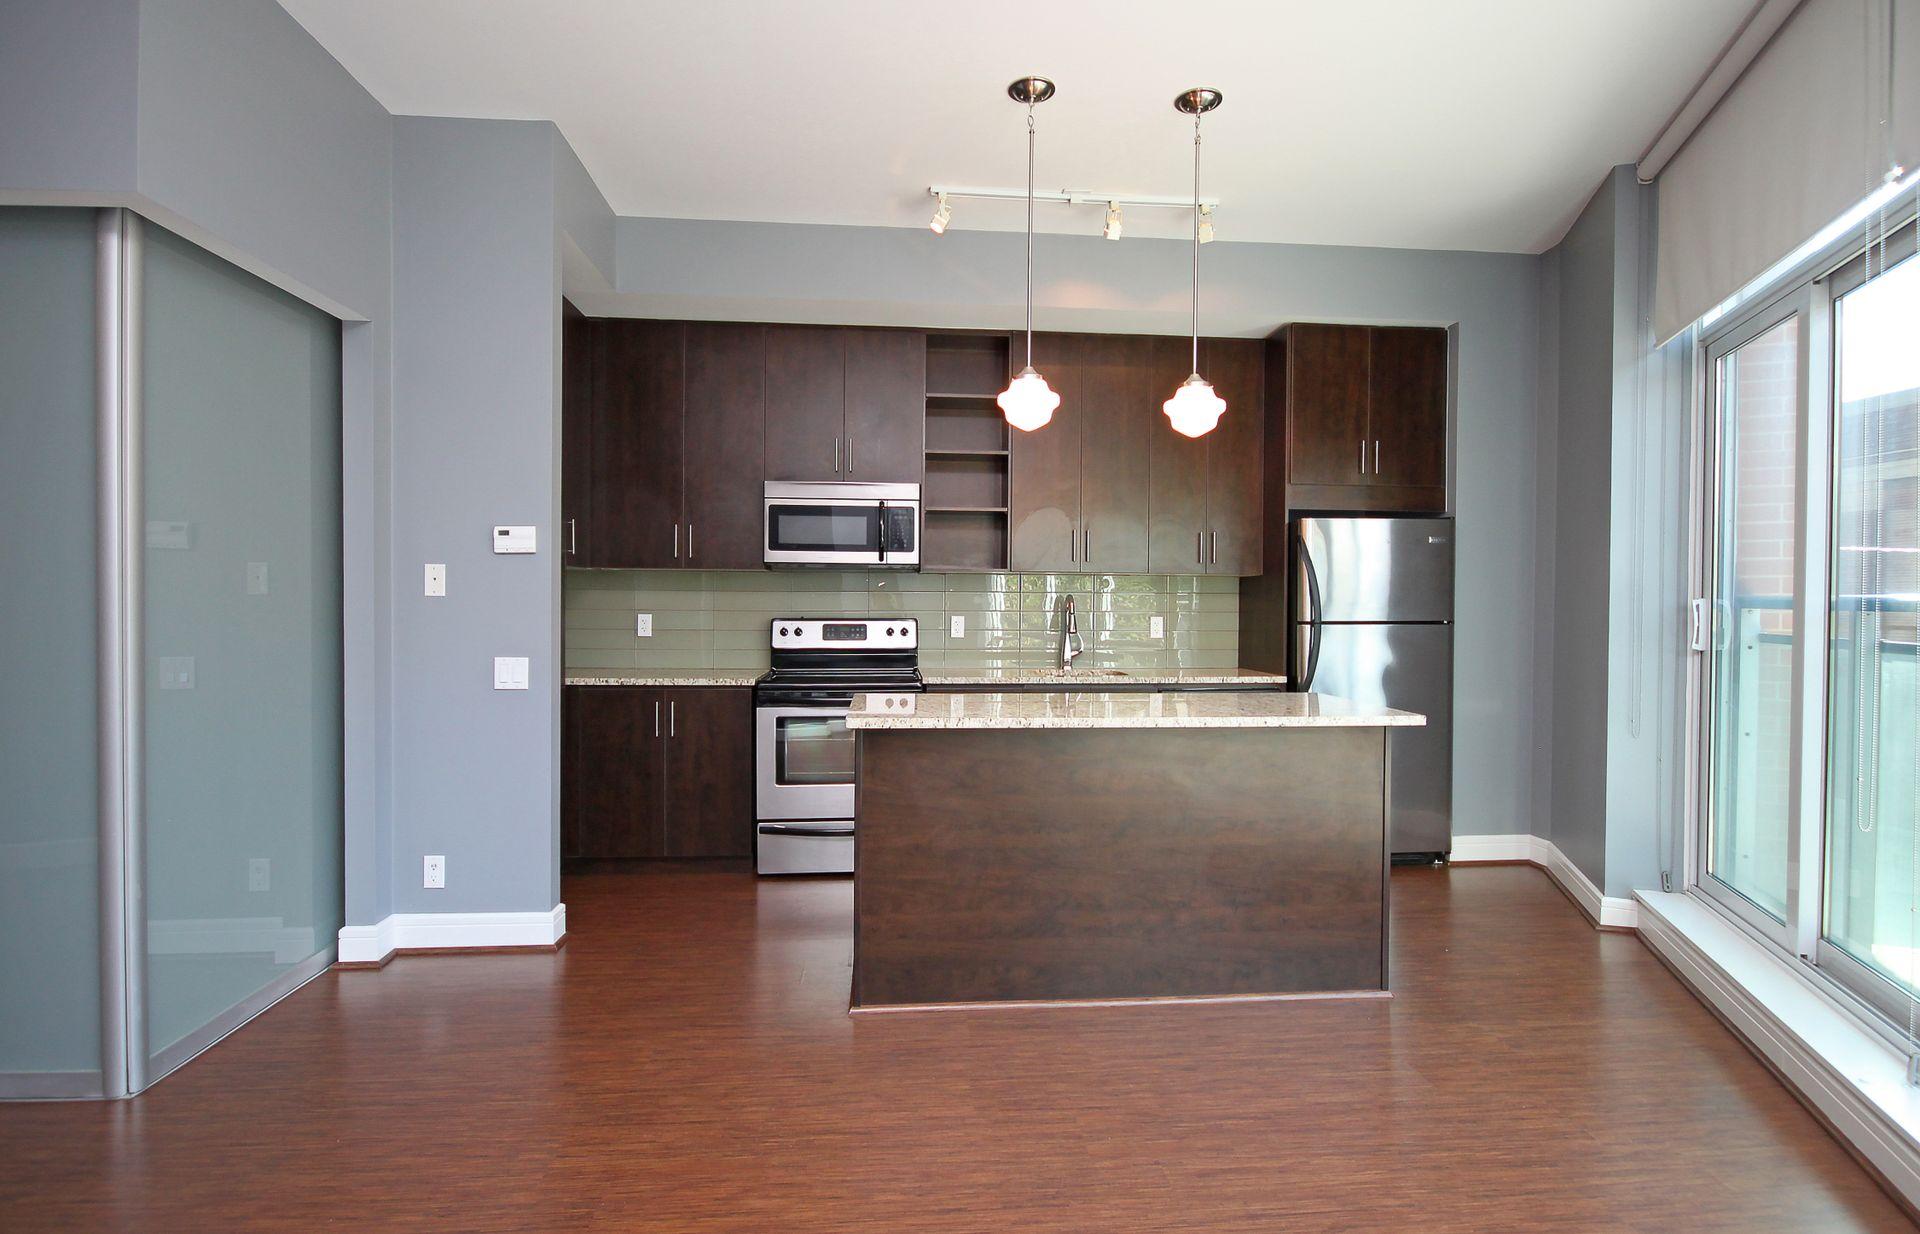 Kitchen at S209 - 112 George Street, Moss Park, Toronto